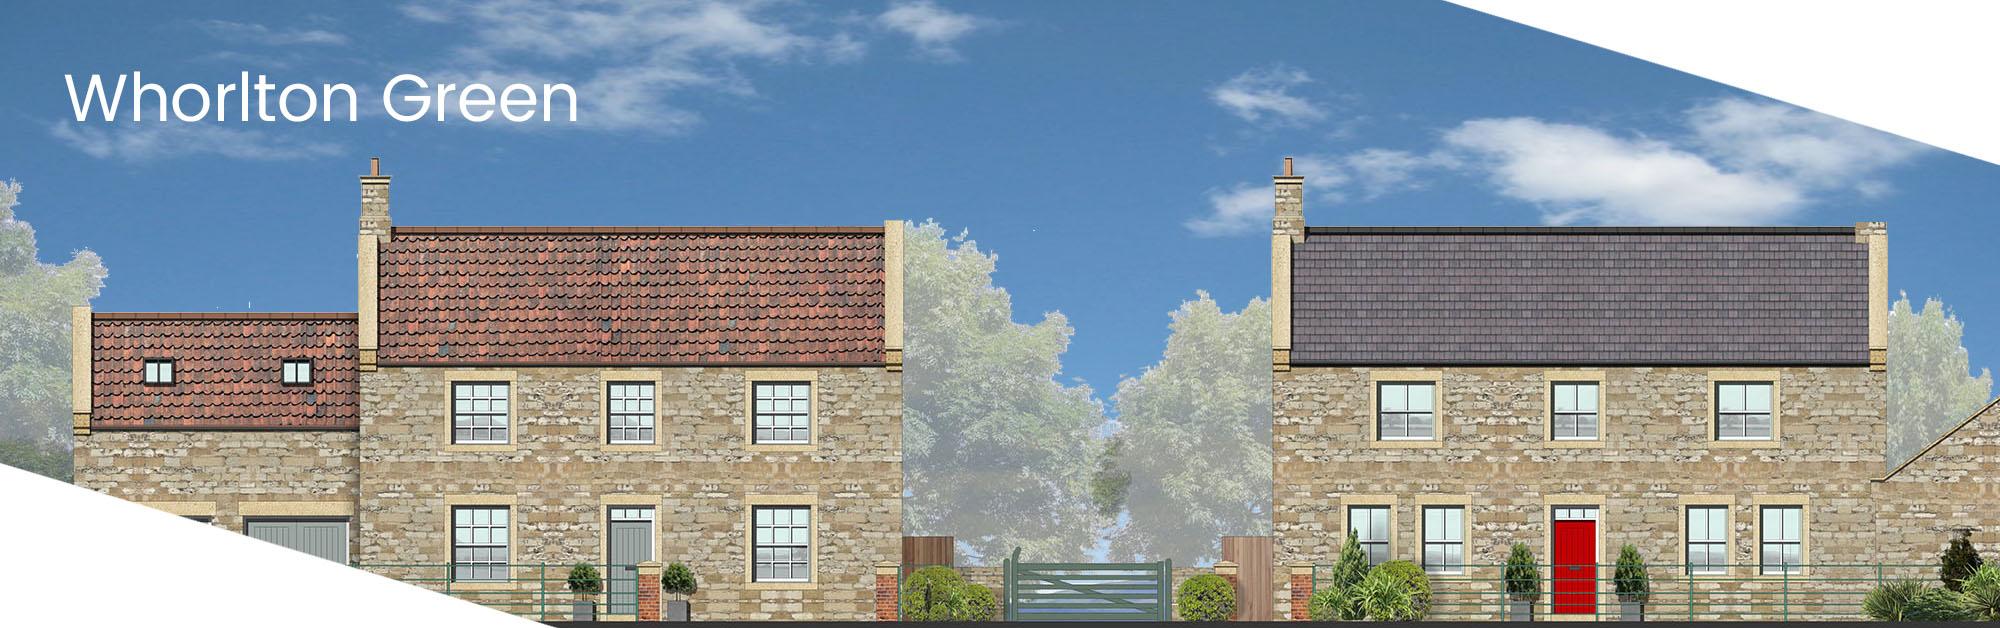 Niven Architects - Whorlton Green.jpg